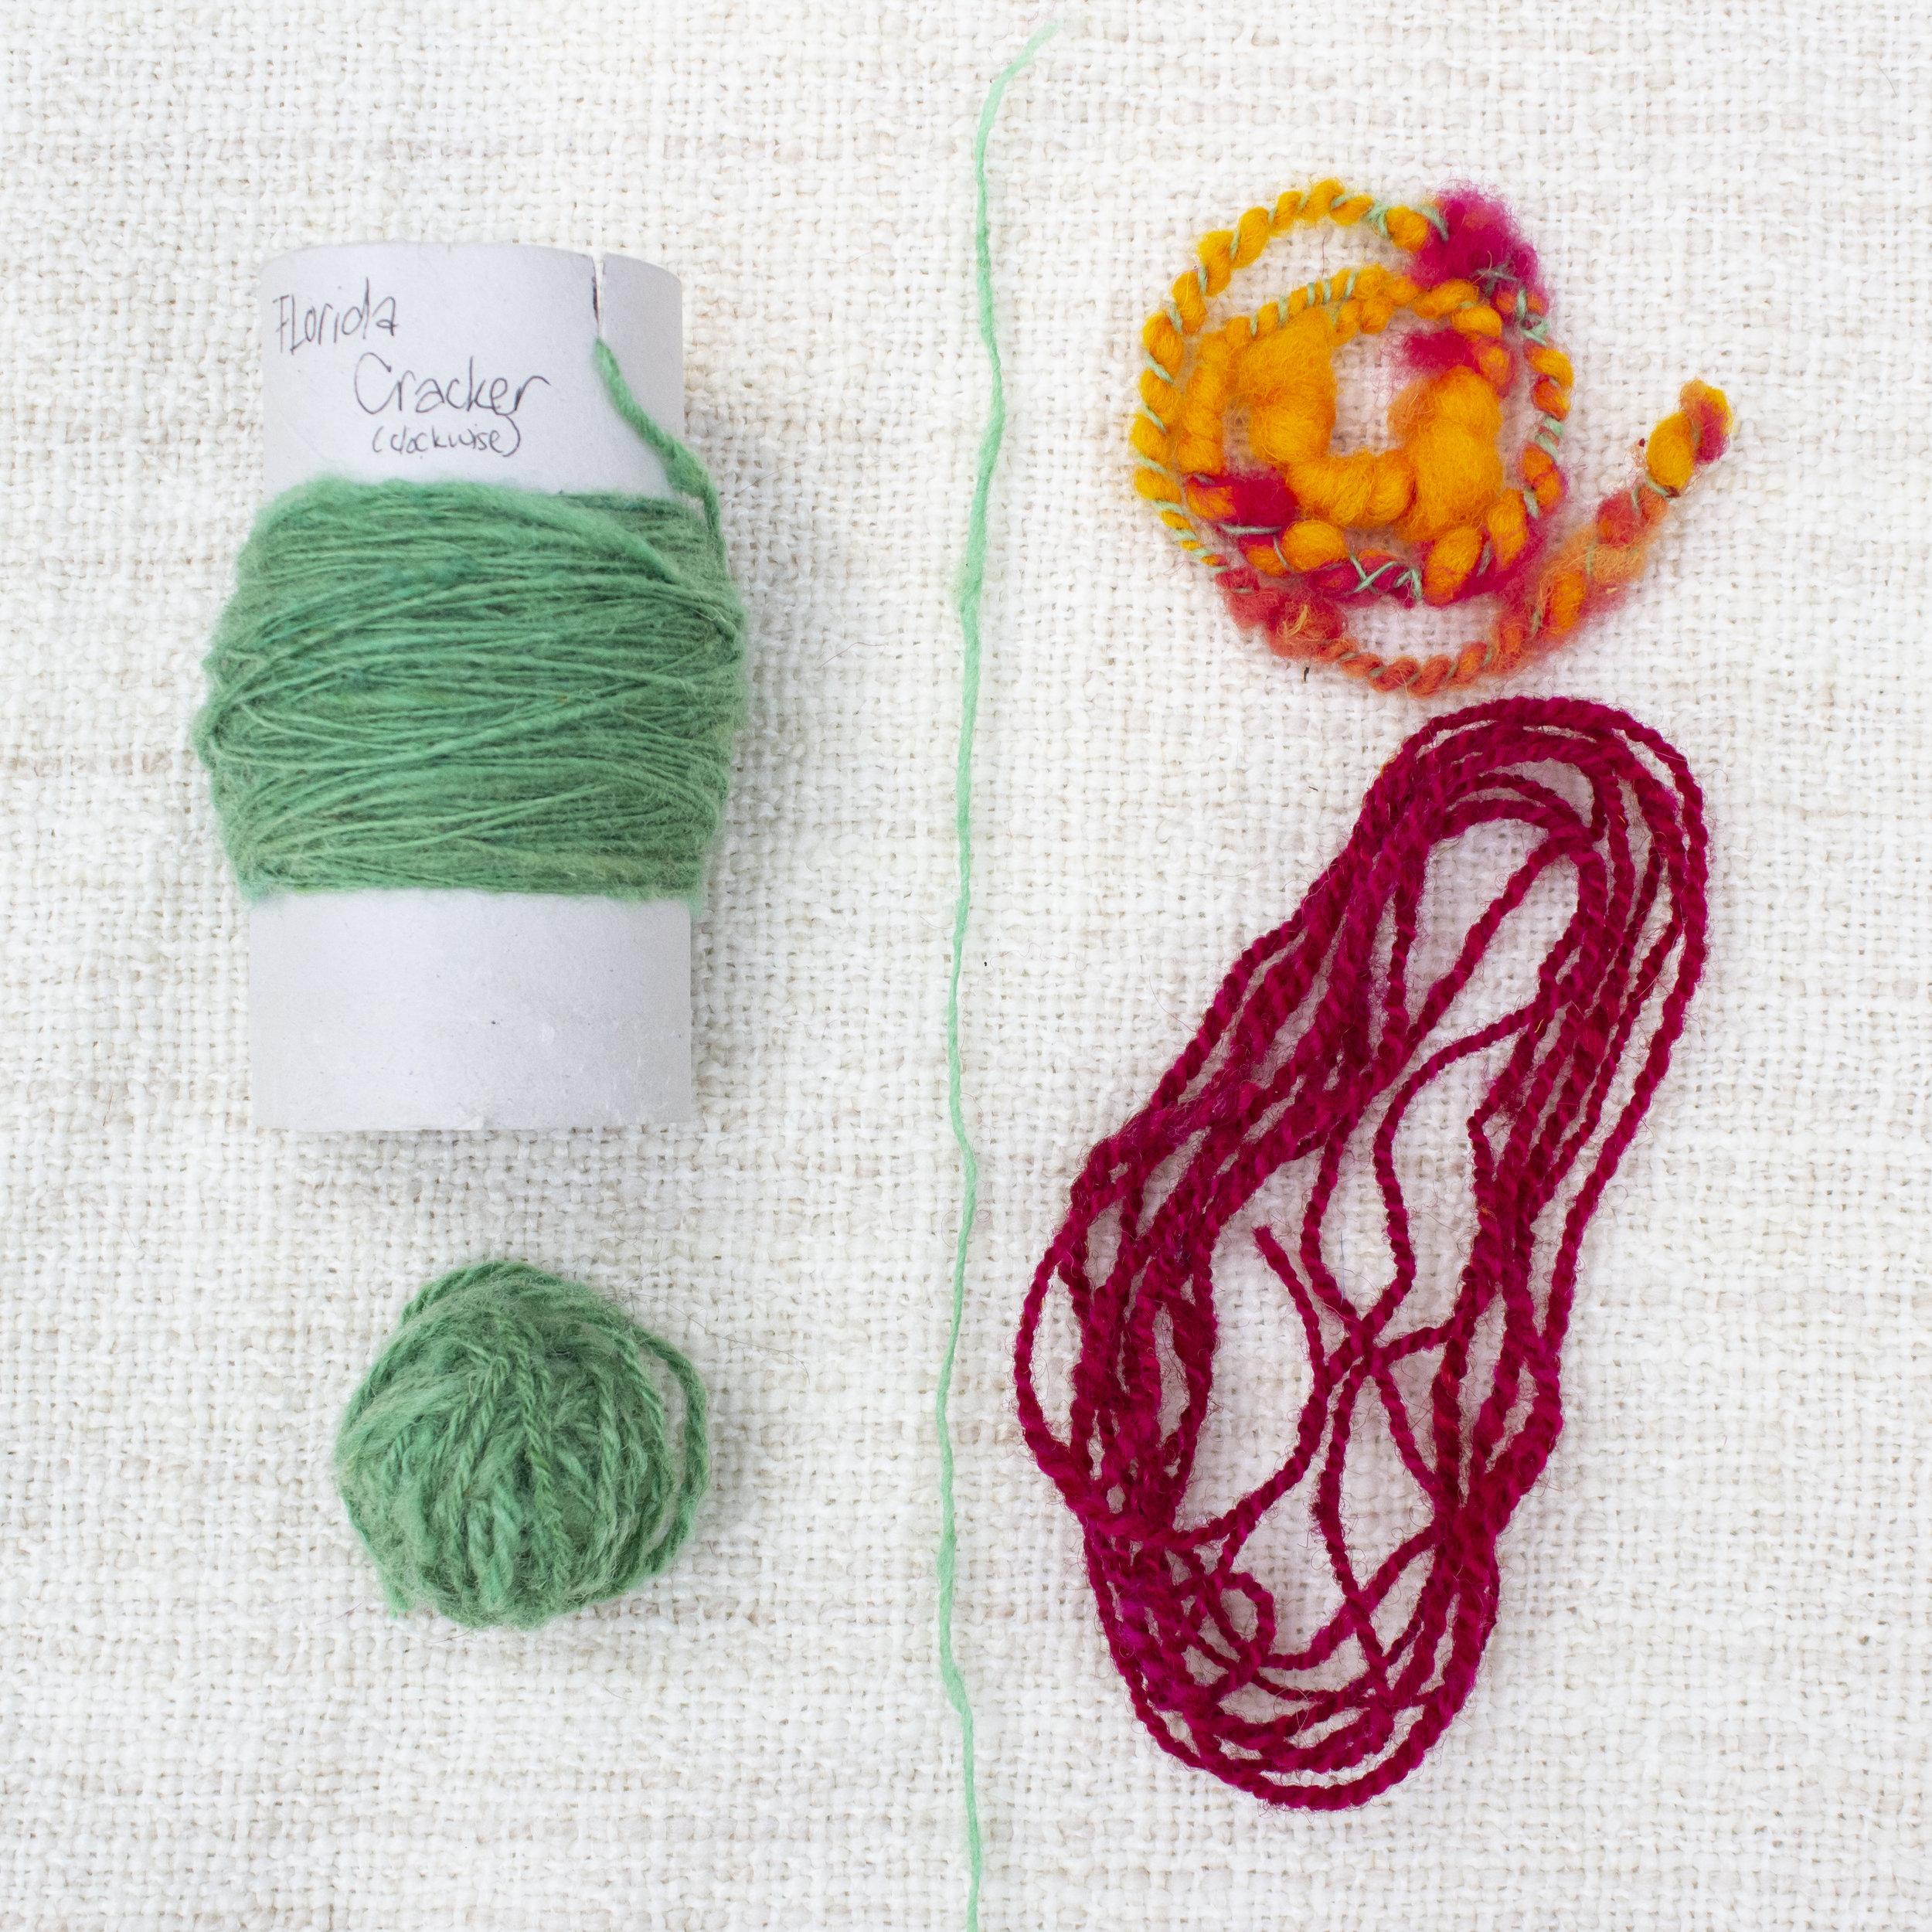 Various spun yarns - single, poofy thick & thin art yarn, 2-ply red, navajo (chain) plied green